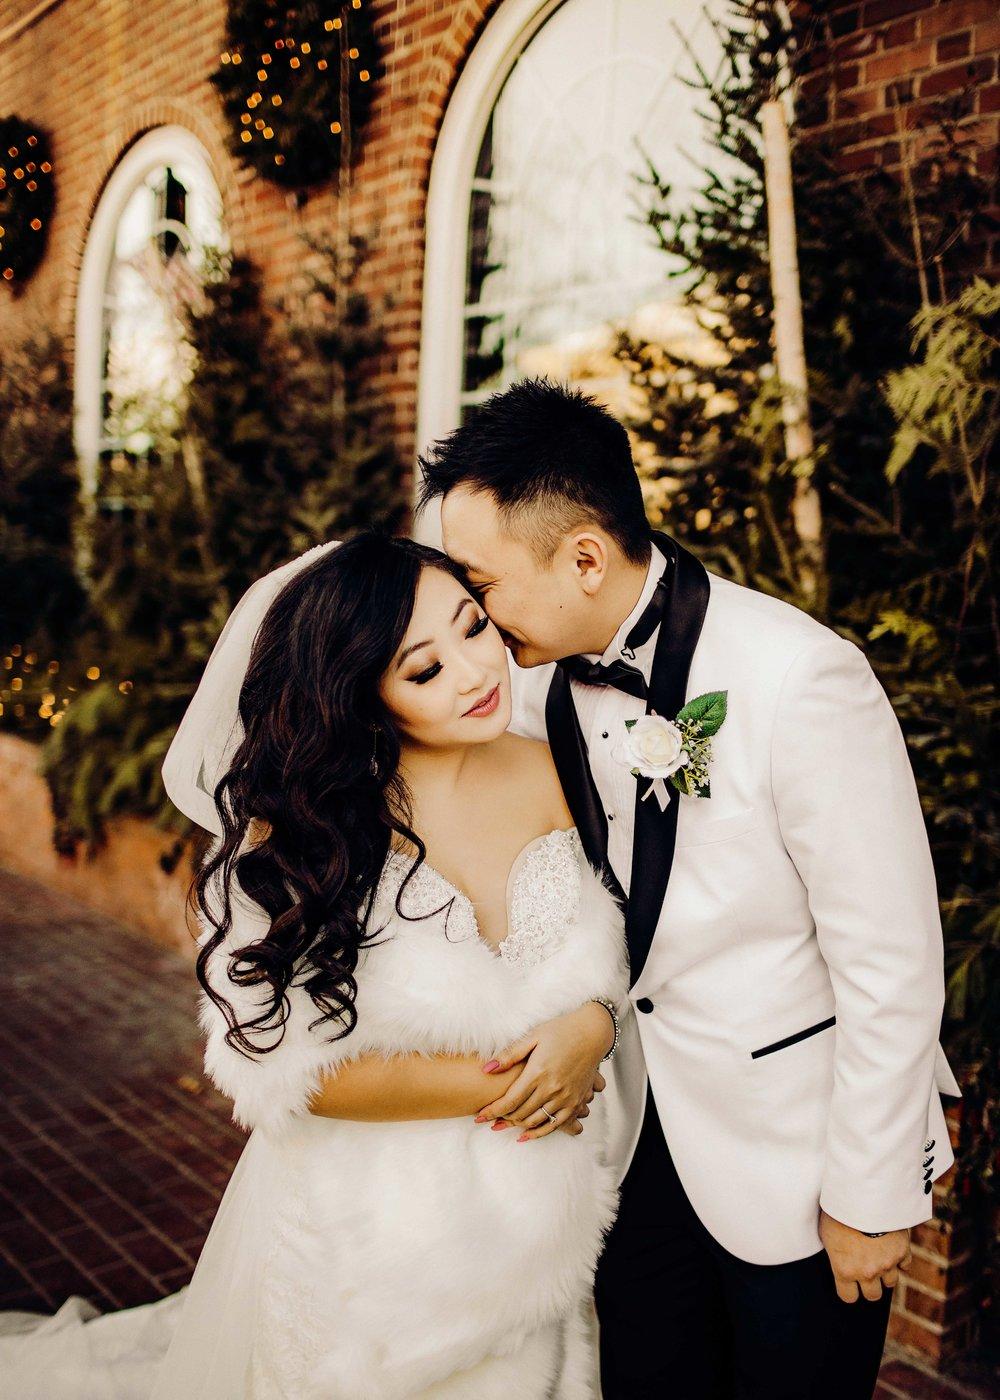 Honey + Yao, Part II, The Bride and Groom-55.jpg